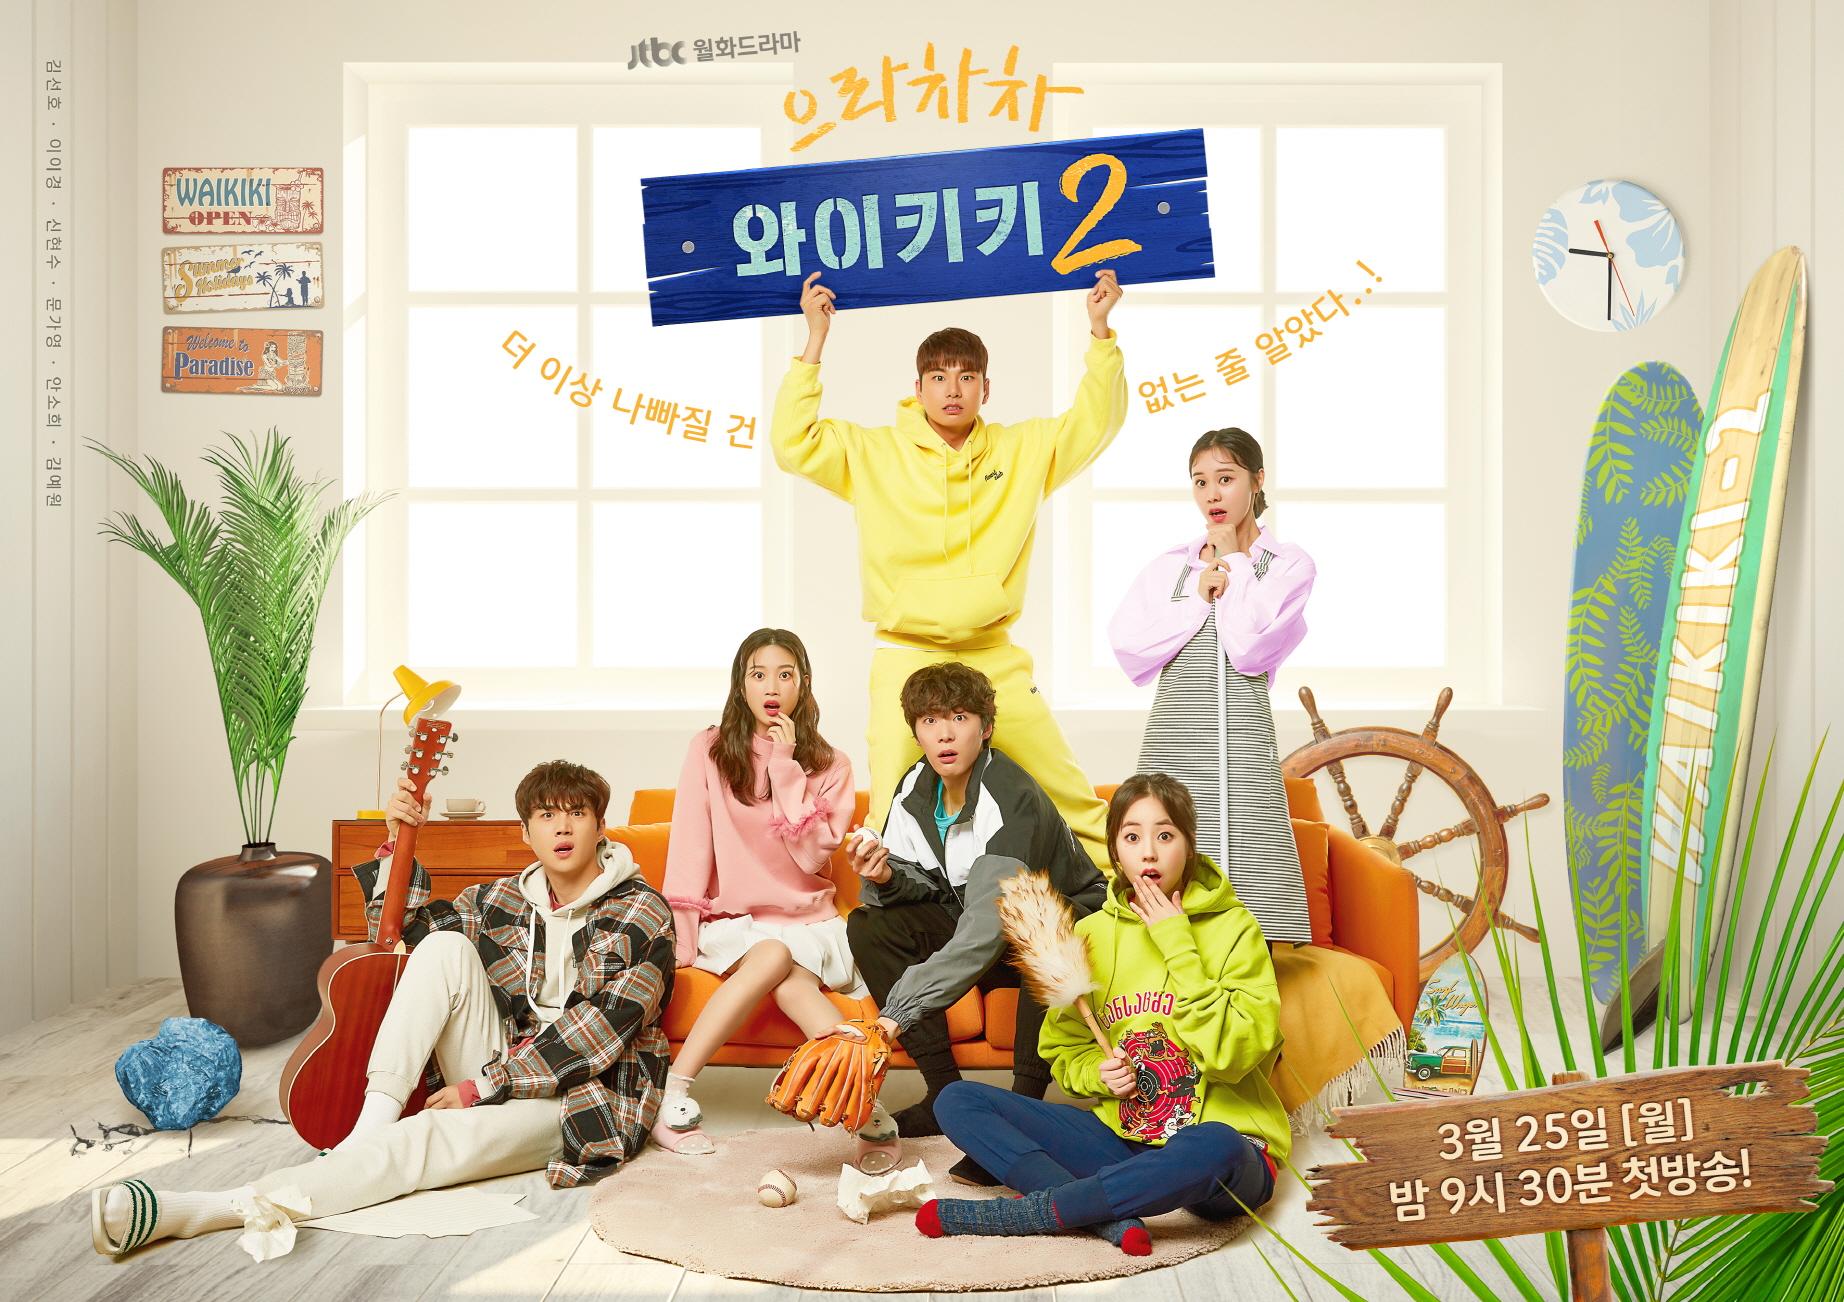 5 Drama Korea Komedi Terlucu Yang Bakal buat Kamu Sakit Perut 4